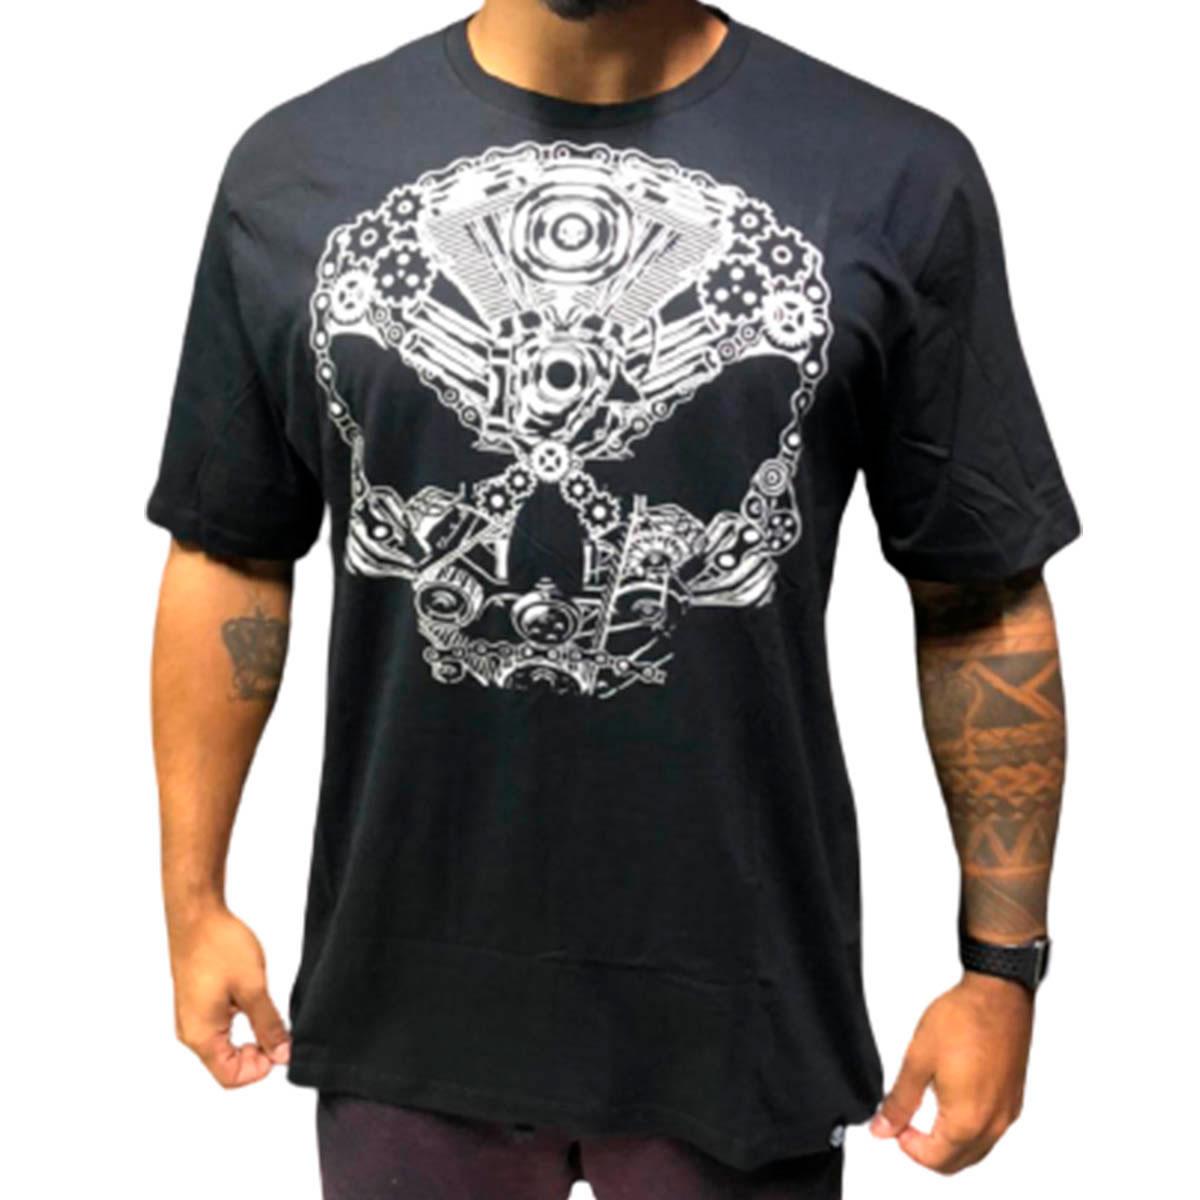 T-shirt Machine Skull Preta - Black Skull Clothing